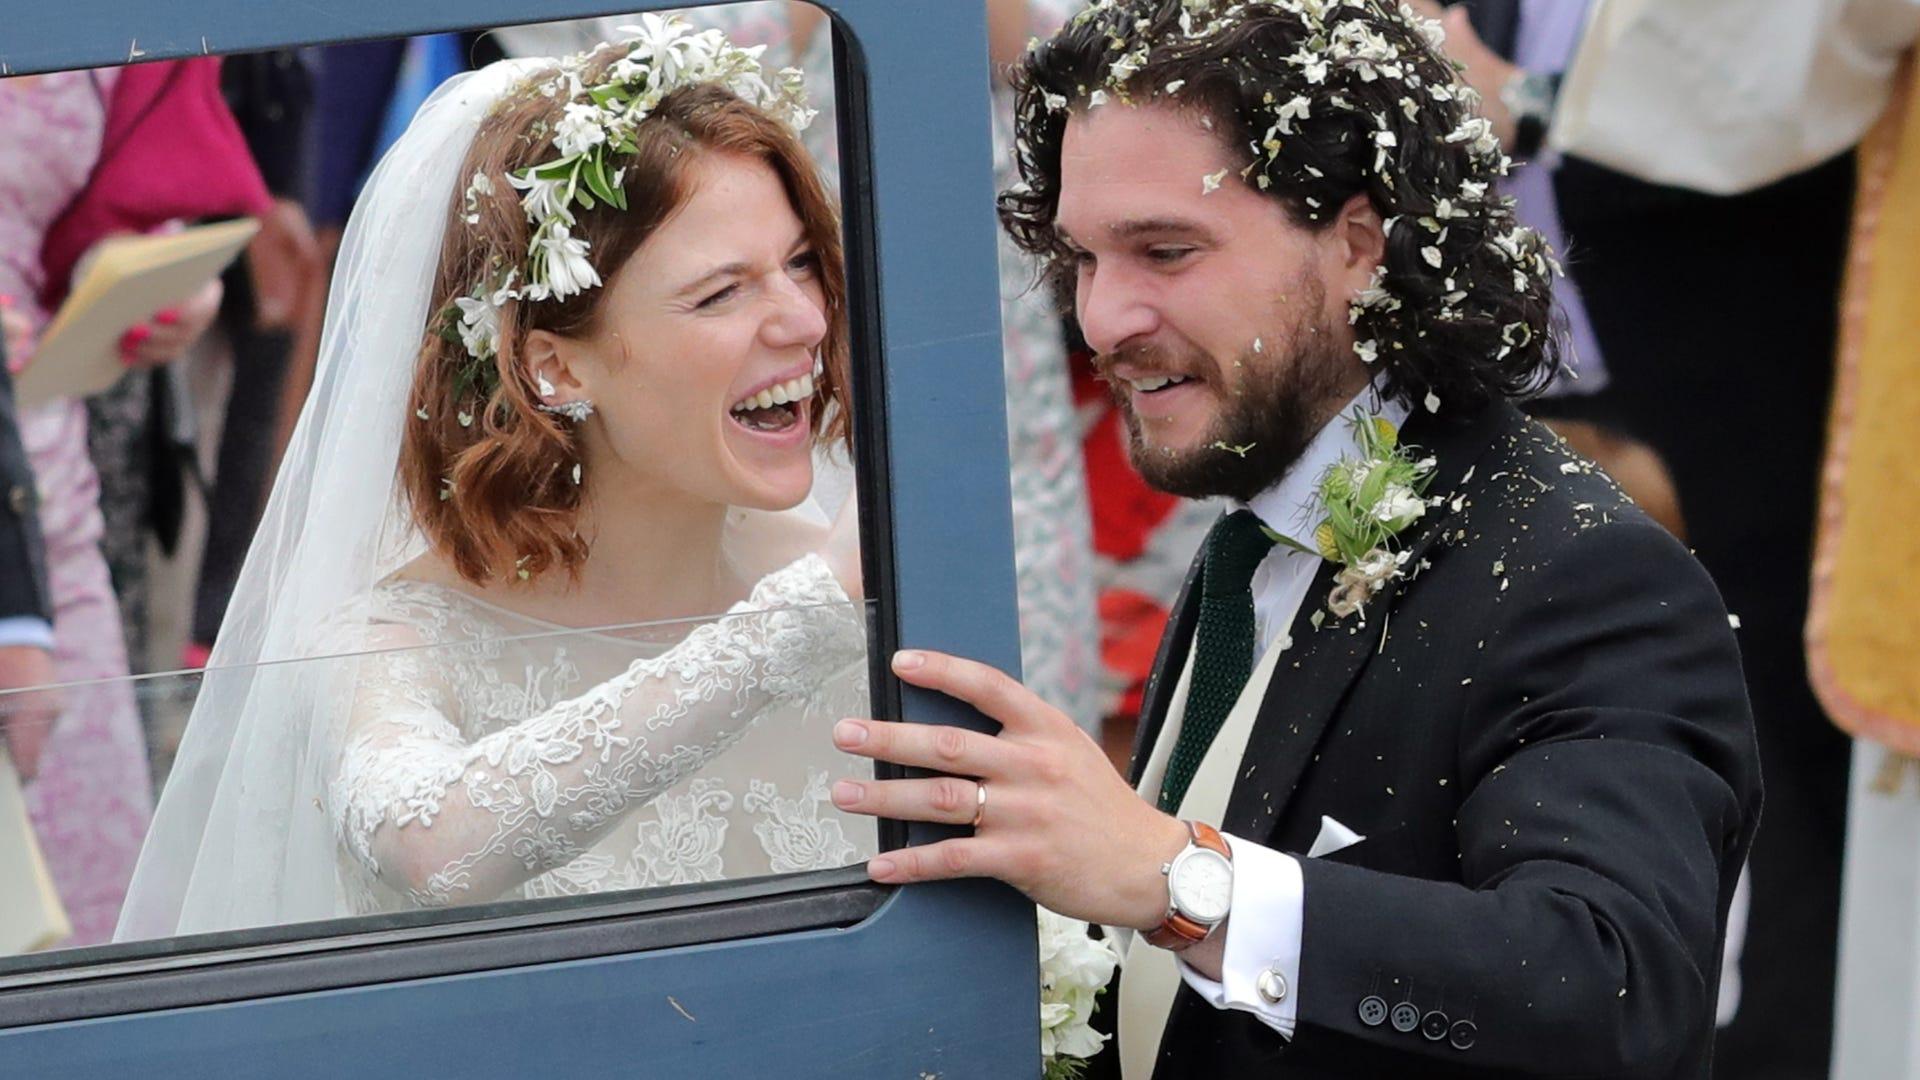 kit-harington-rose-leslie-wedding.jpg